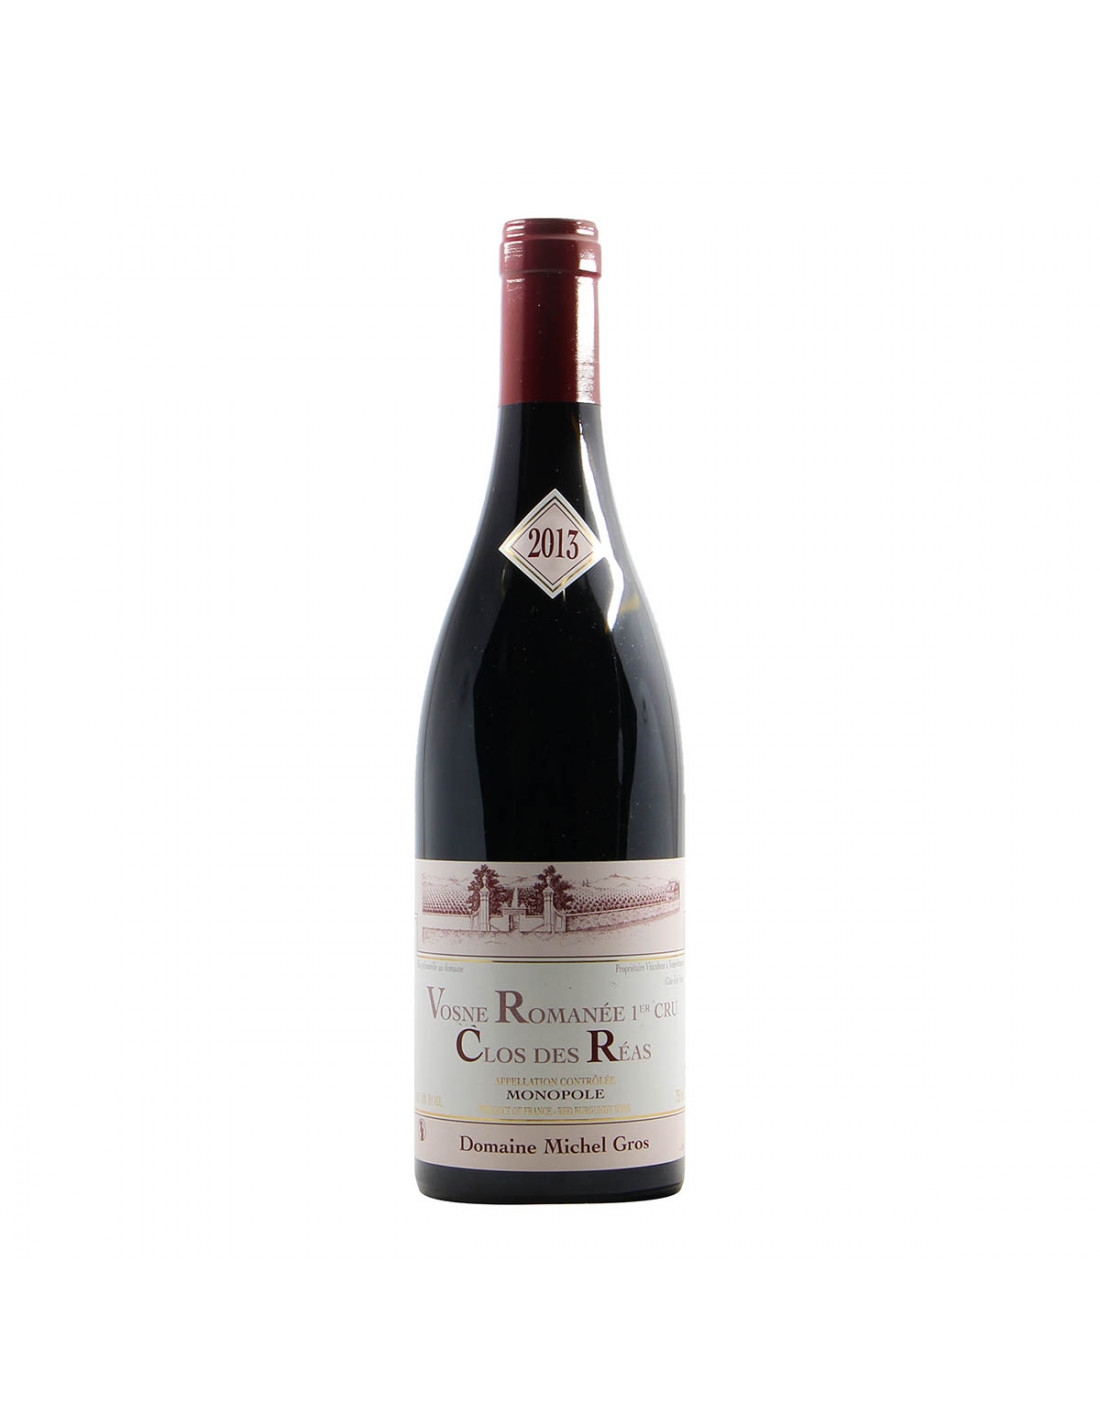 Domaine Michel Gros Vosne Romanee 1er Cru Clos des Reas 2013 Grandi Bottiglie